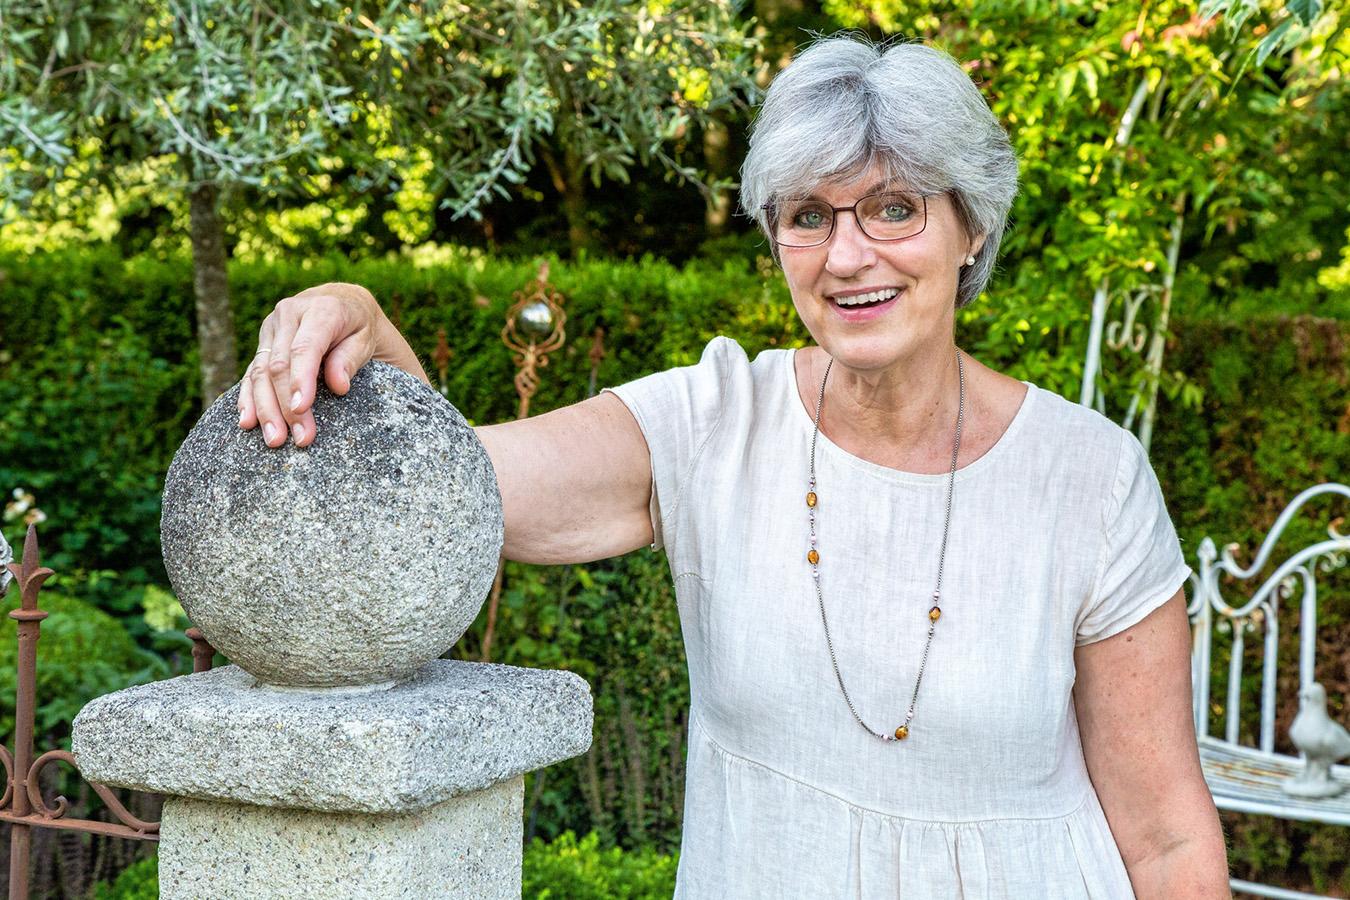 Rosengarten Petting: Brigitta in ihrem Gartenidyll am Waginger See